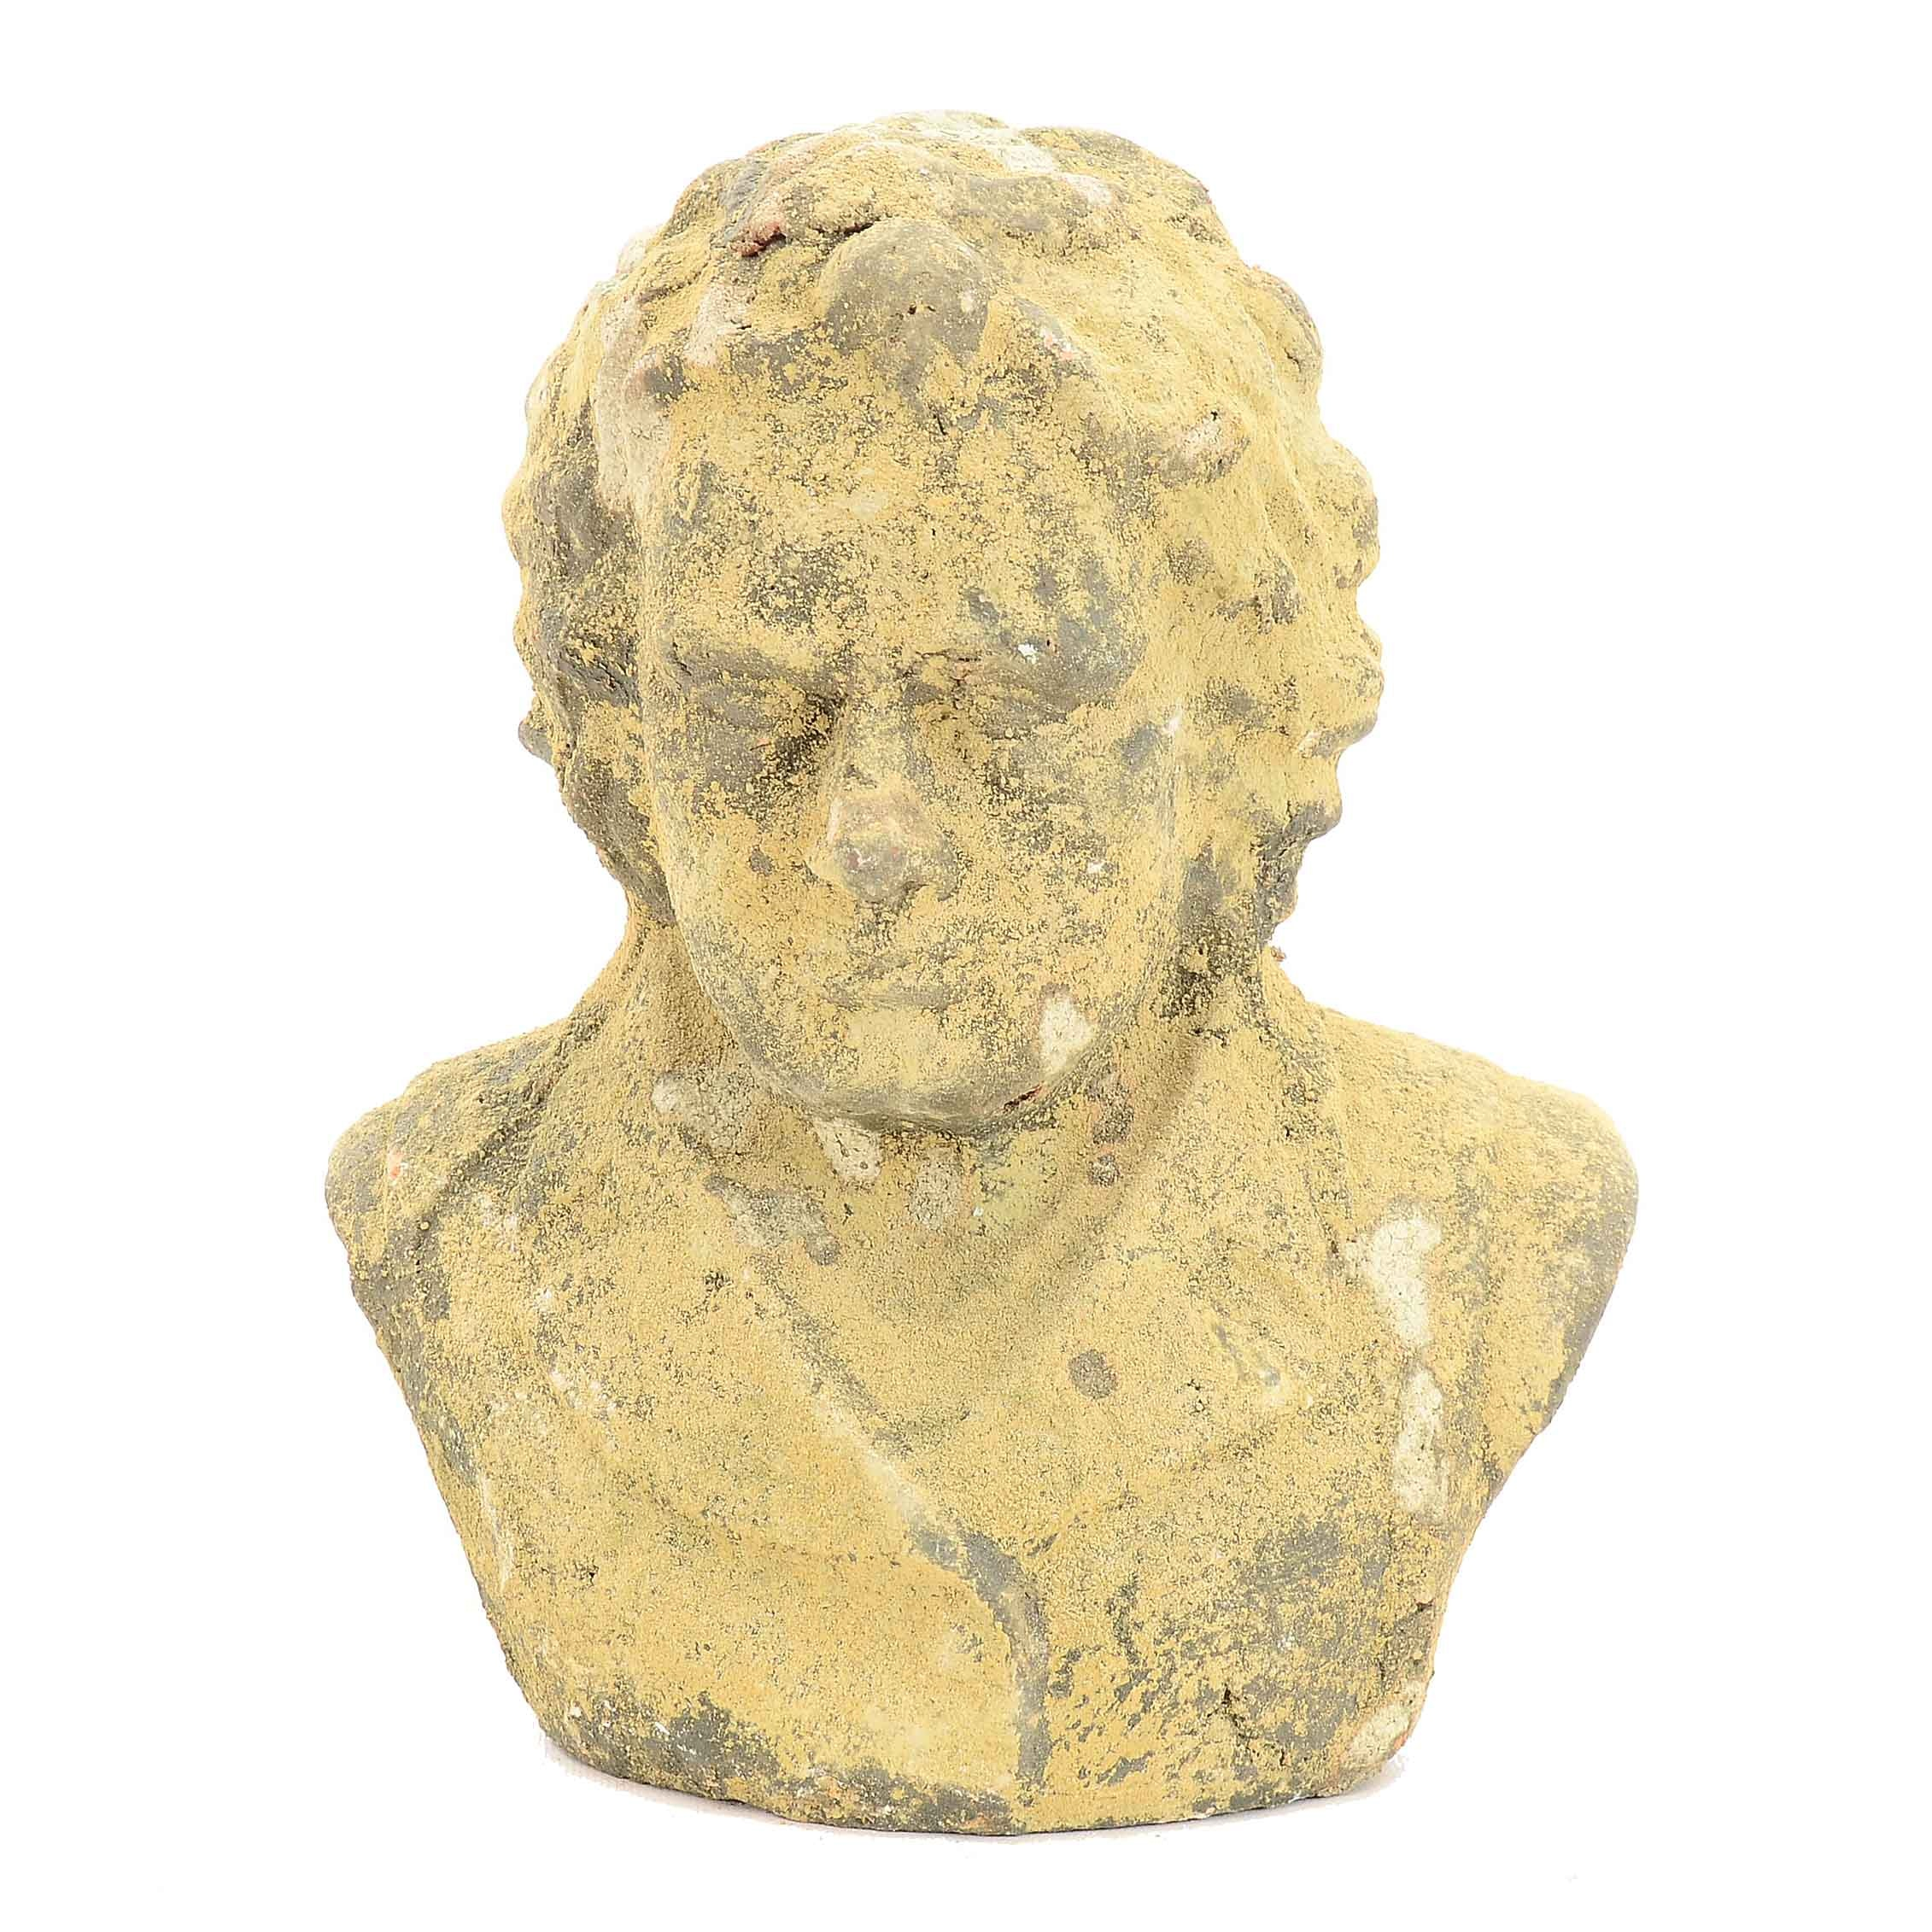 Antiqued Ceramic Bust of Beethoven